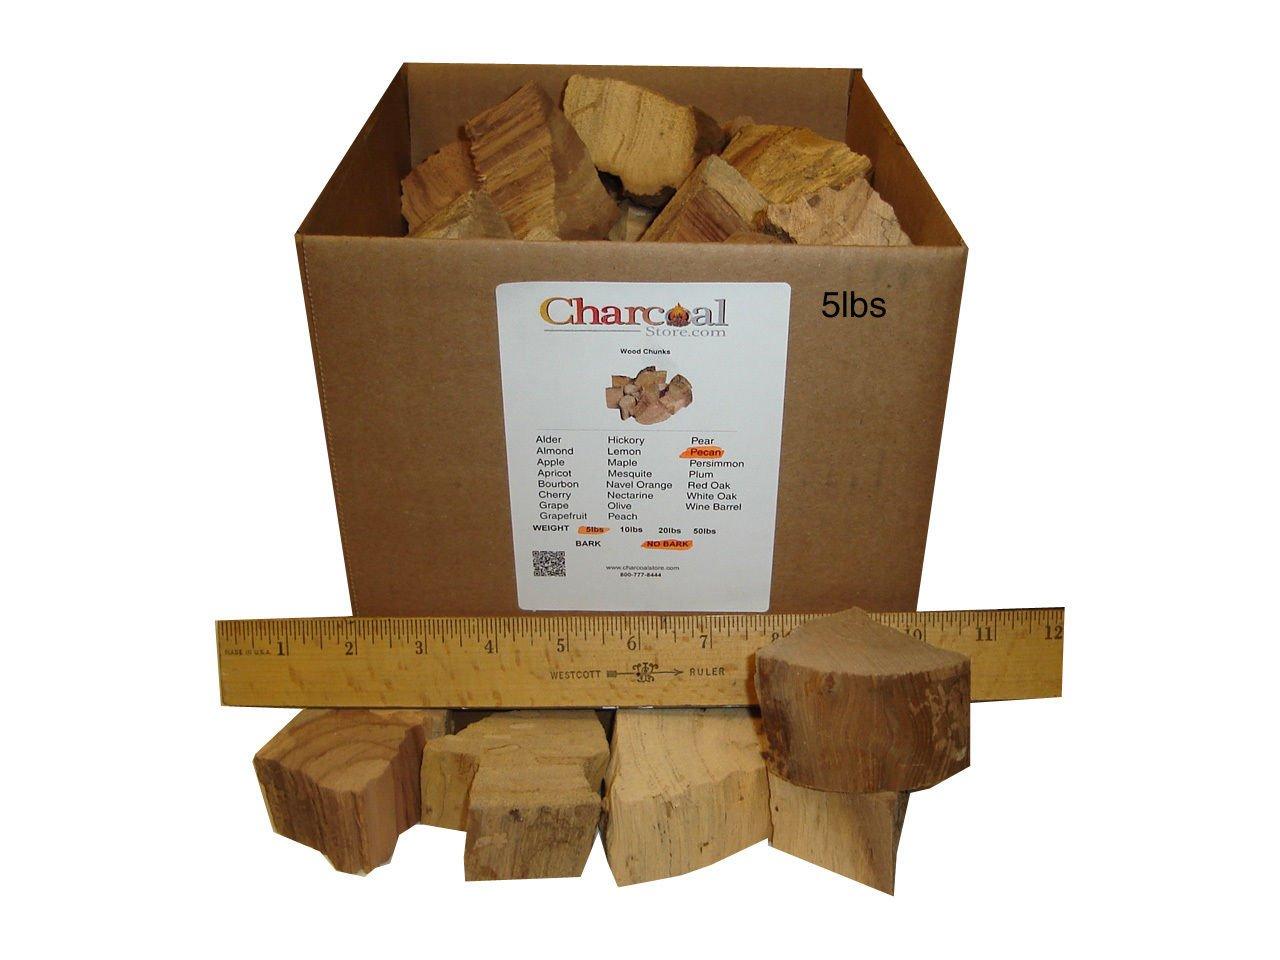 CharcoalStore Pecan Smoking Wood Chunks - No Bark (20 Pounds)